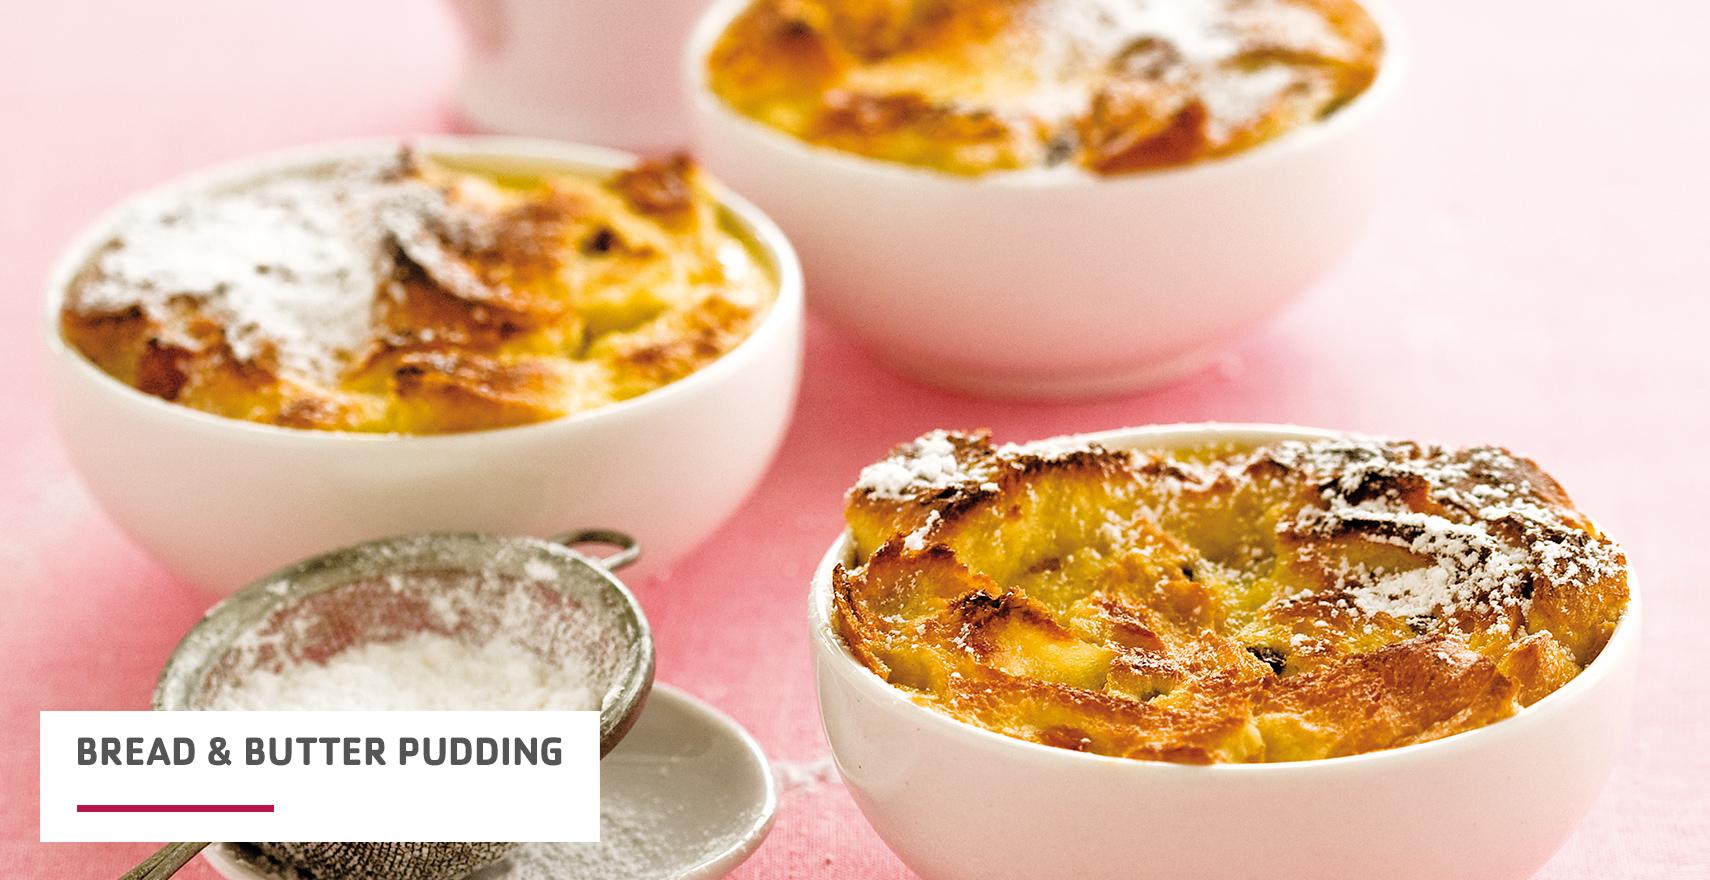 Bread-&-Butter-Pudding-header.jpg